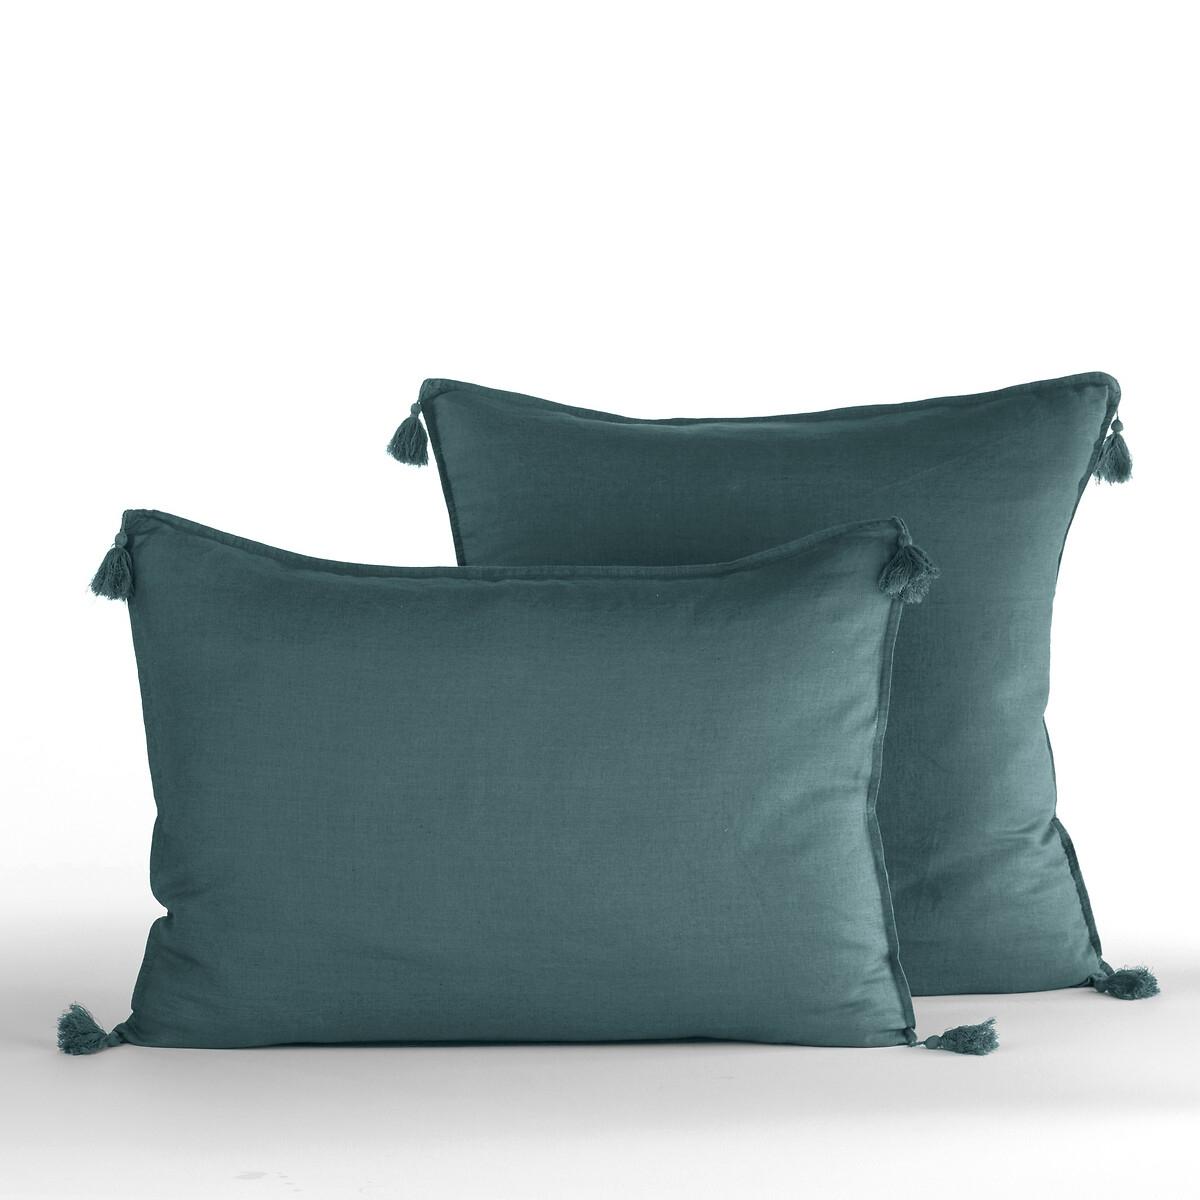 Наволочка La Redoute Из льна Carly 65 x 65 см зеленый чехол la redoute для подушки или наволочка однотонного цвета с помпонами riad 65 x 65 см розовый